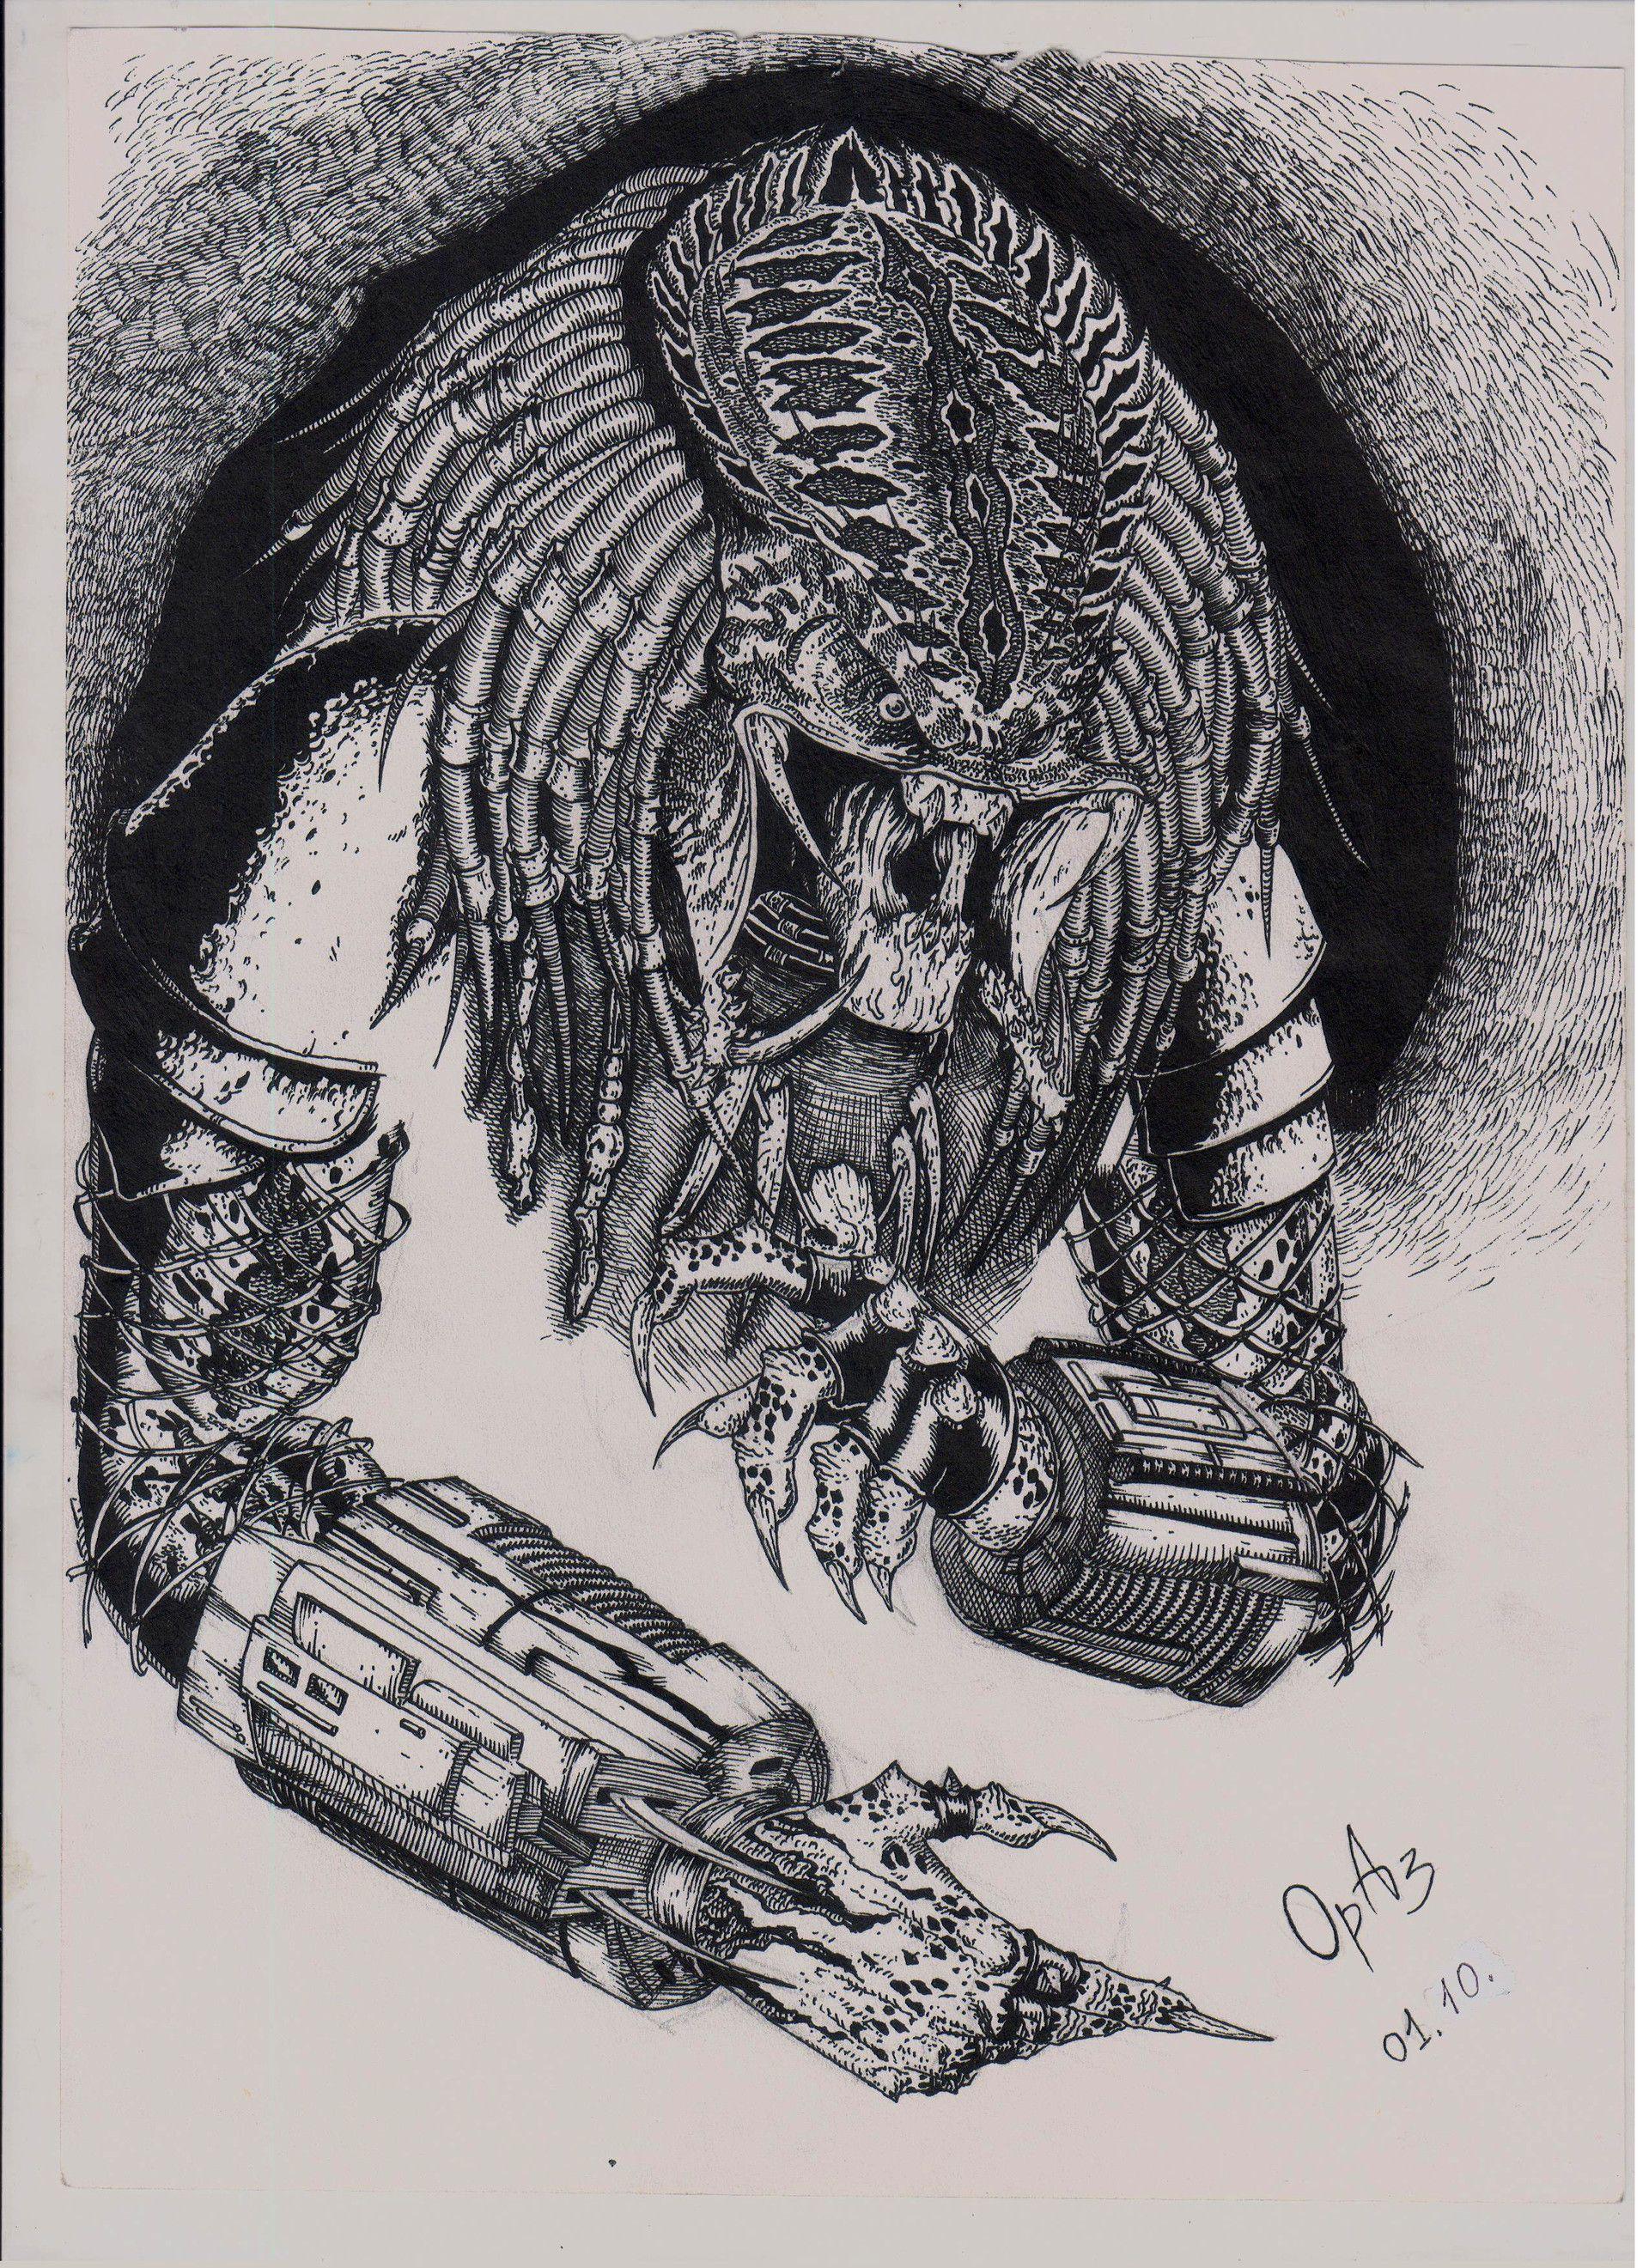 azat-orynbassarov-predator.jpg (1920×2641)